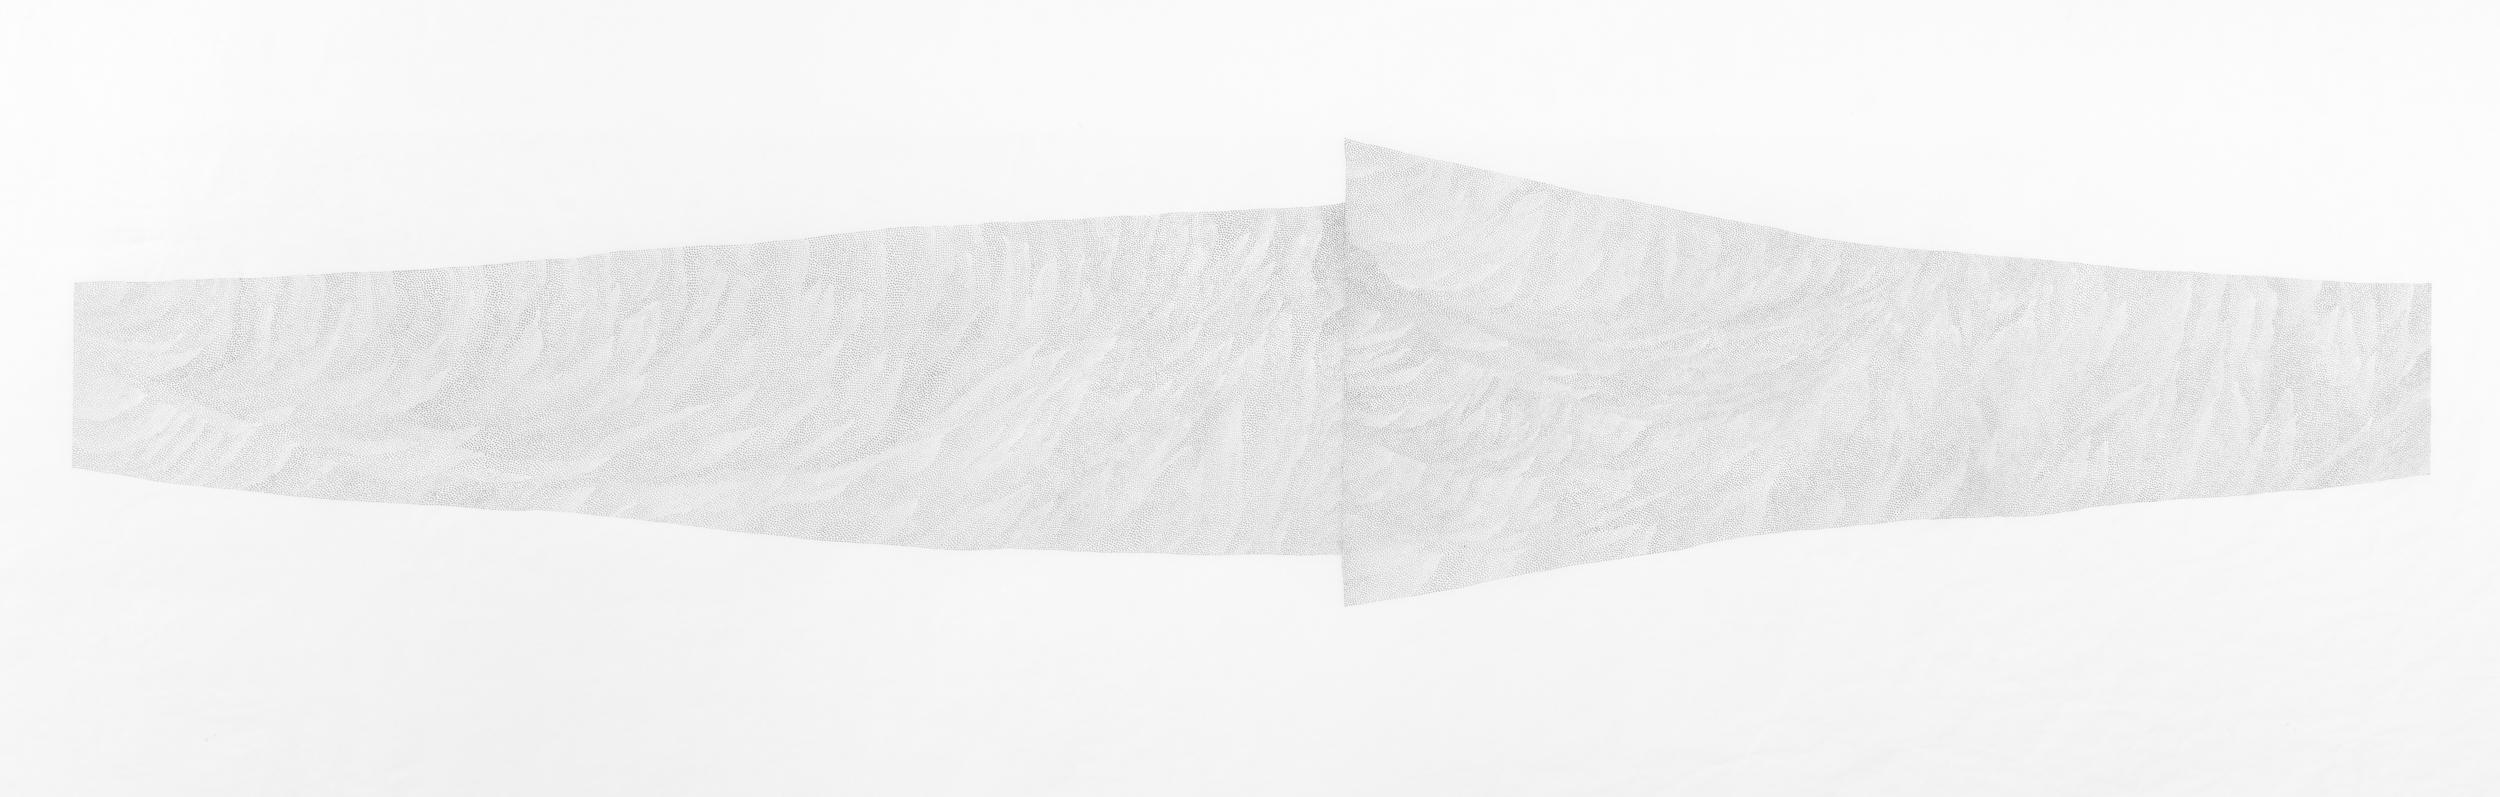 <em>Both Ways</em>, pencil on design paper, 66 x 198 cm